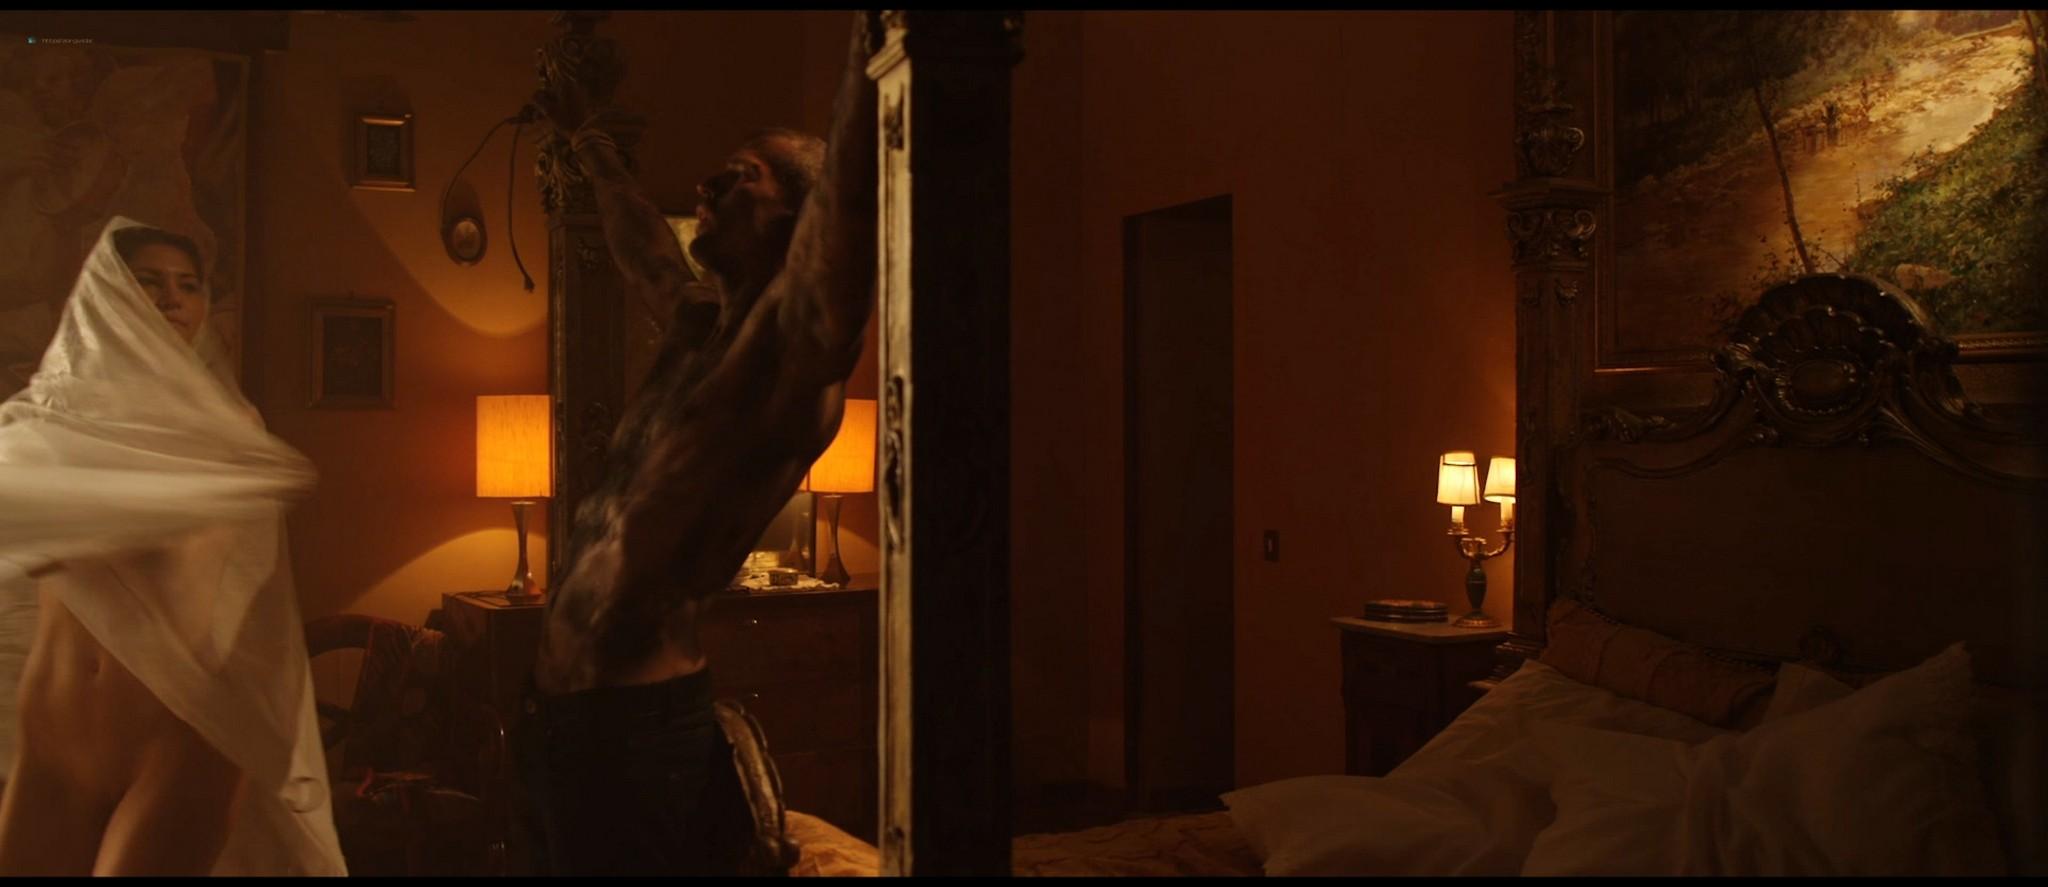 Elena Mirela nude Grazia Leone, Denny Méndez nude too - Blood Trap (2016) HD 1080p BluRay (9)